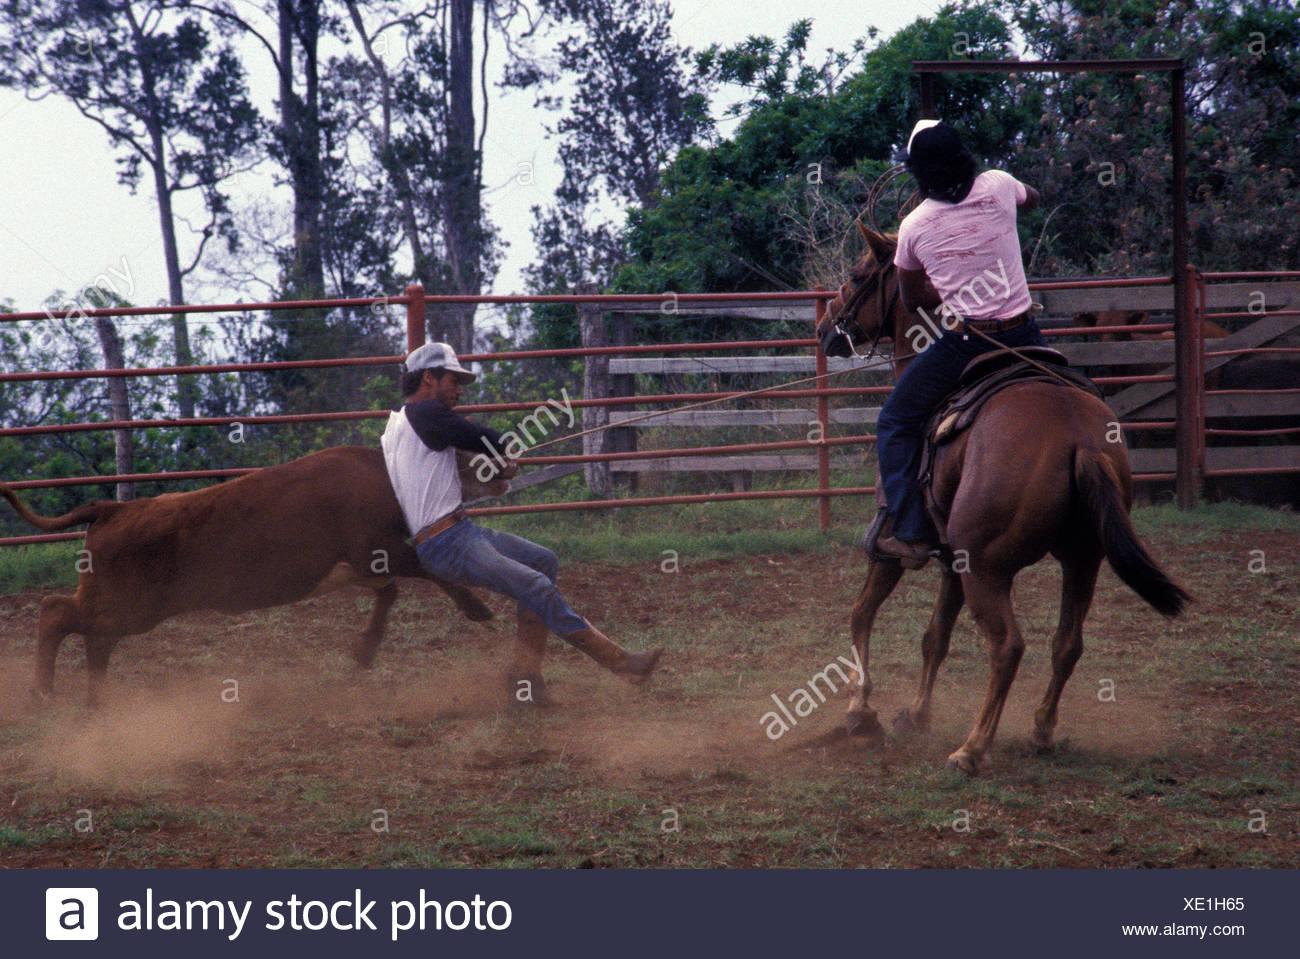 88f7e6fd Paniolos (Hawaiian cowboys) in action, Parker Ranch, Waimea (Kamuela) -